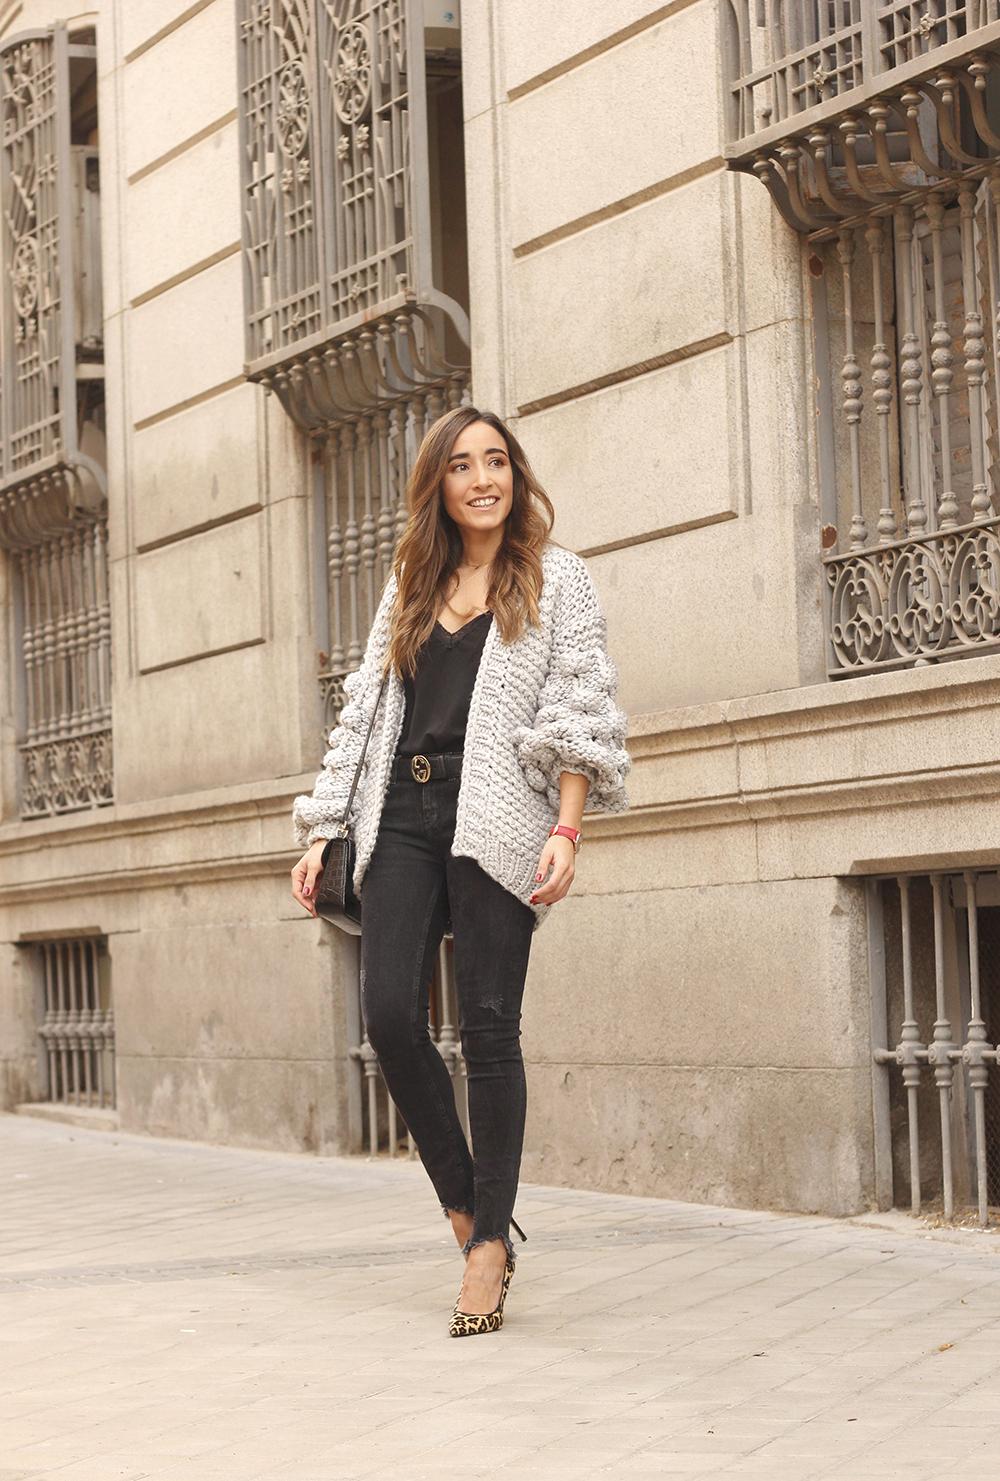 Grey cardigan black jeans folli folie watch leopard print heels starbucks tea street style fall outfit 201802